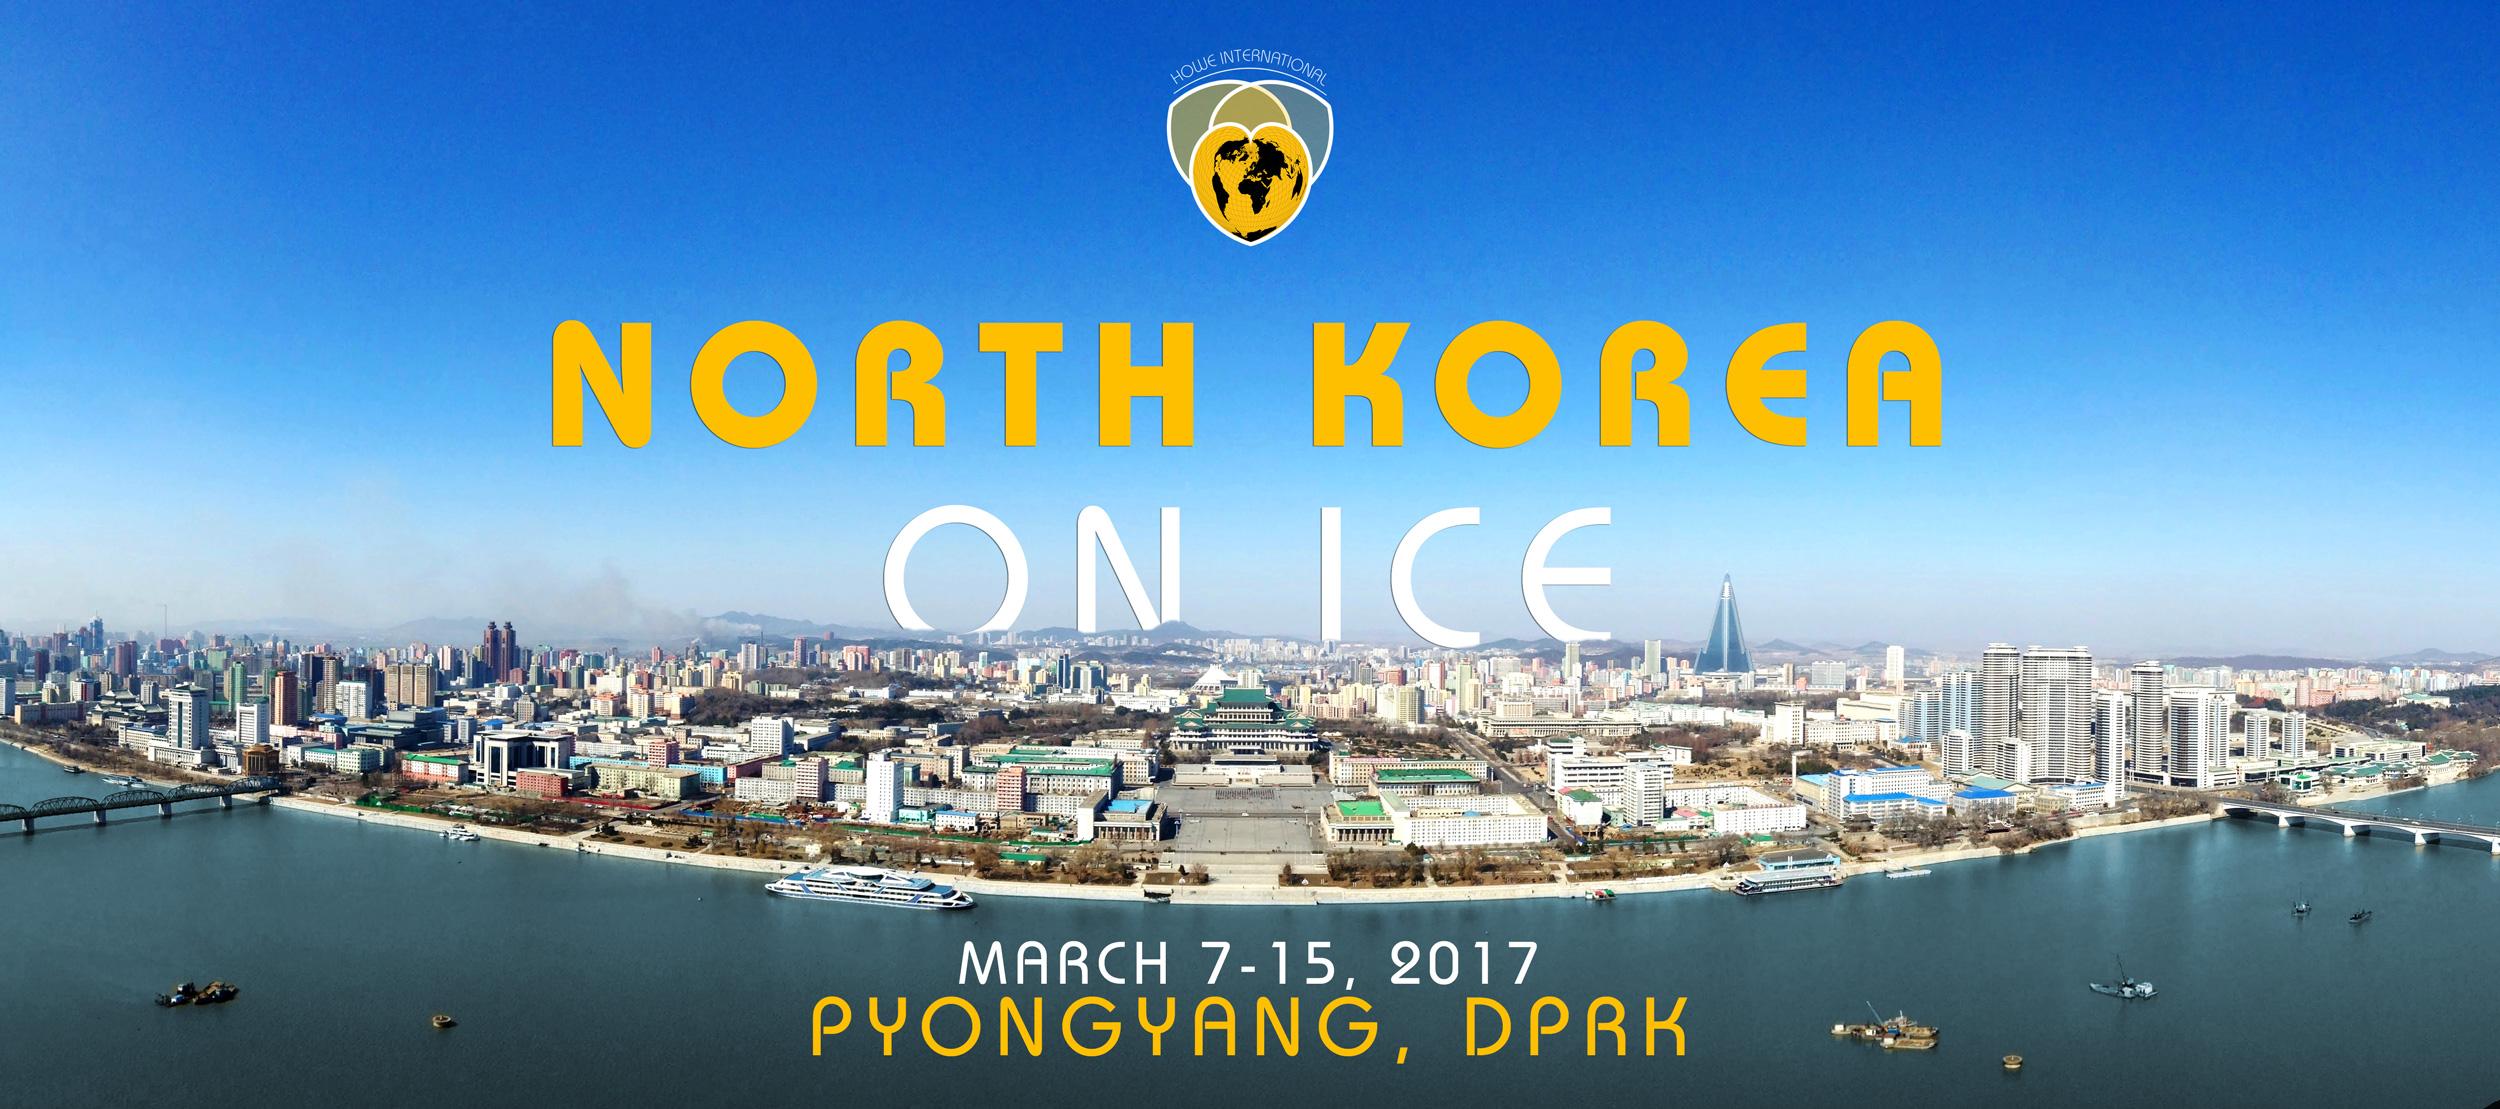 http://www.marketwire.com/library/MwGo/2016/12/7/11G124450/Images/Pyongyang_Announcement2-d4163b61f6a4bfa3a707795dc12dc5e9.jpg